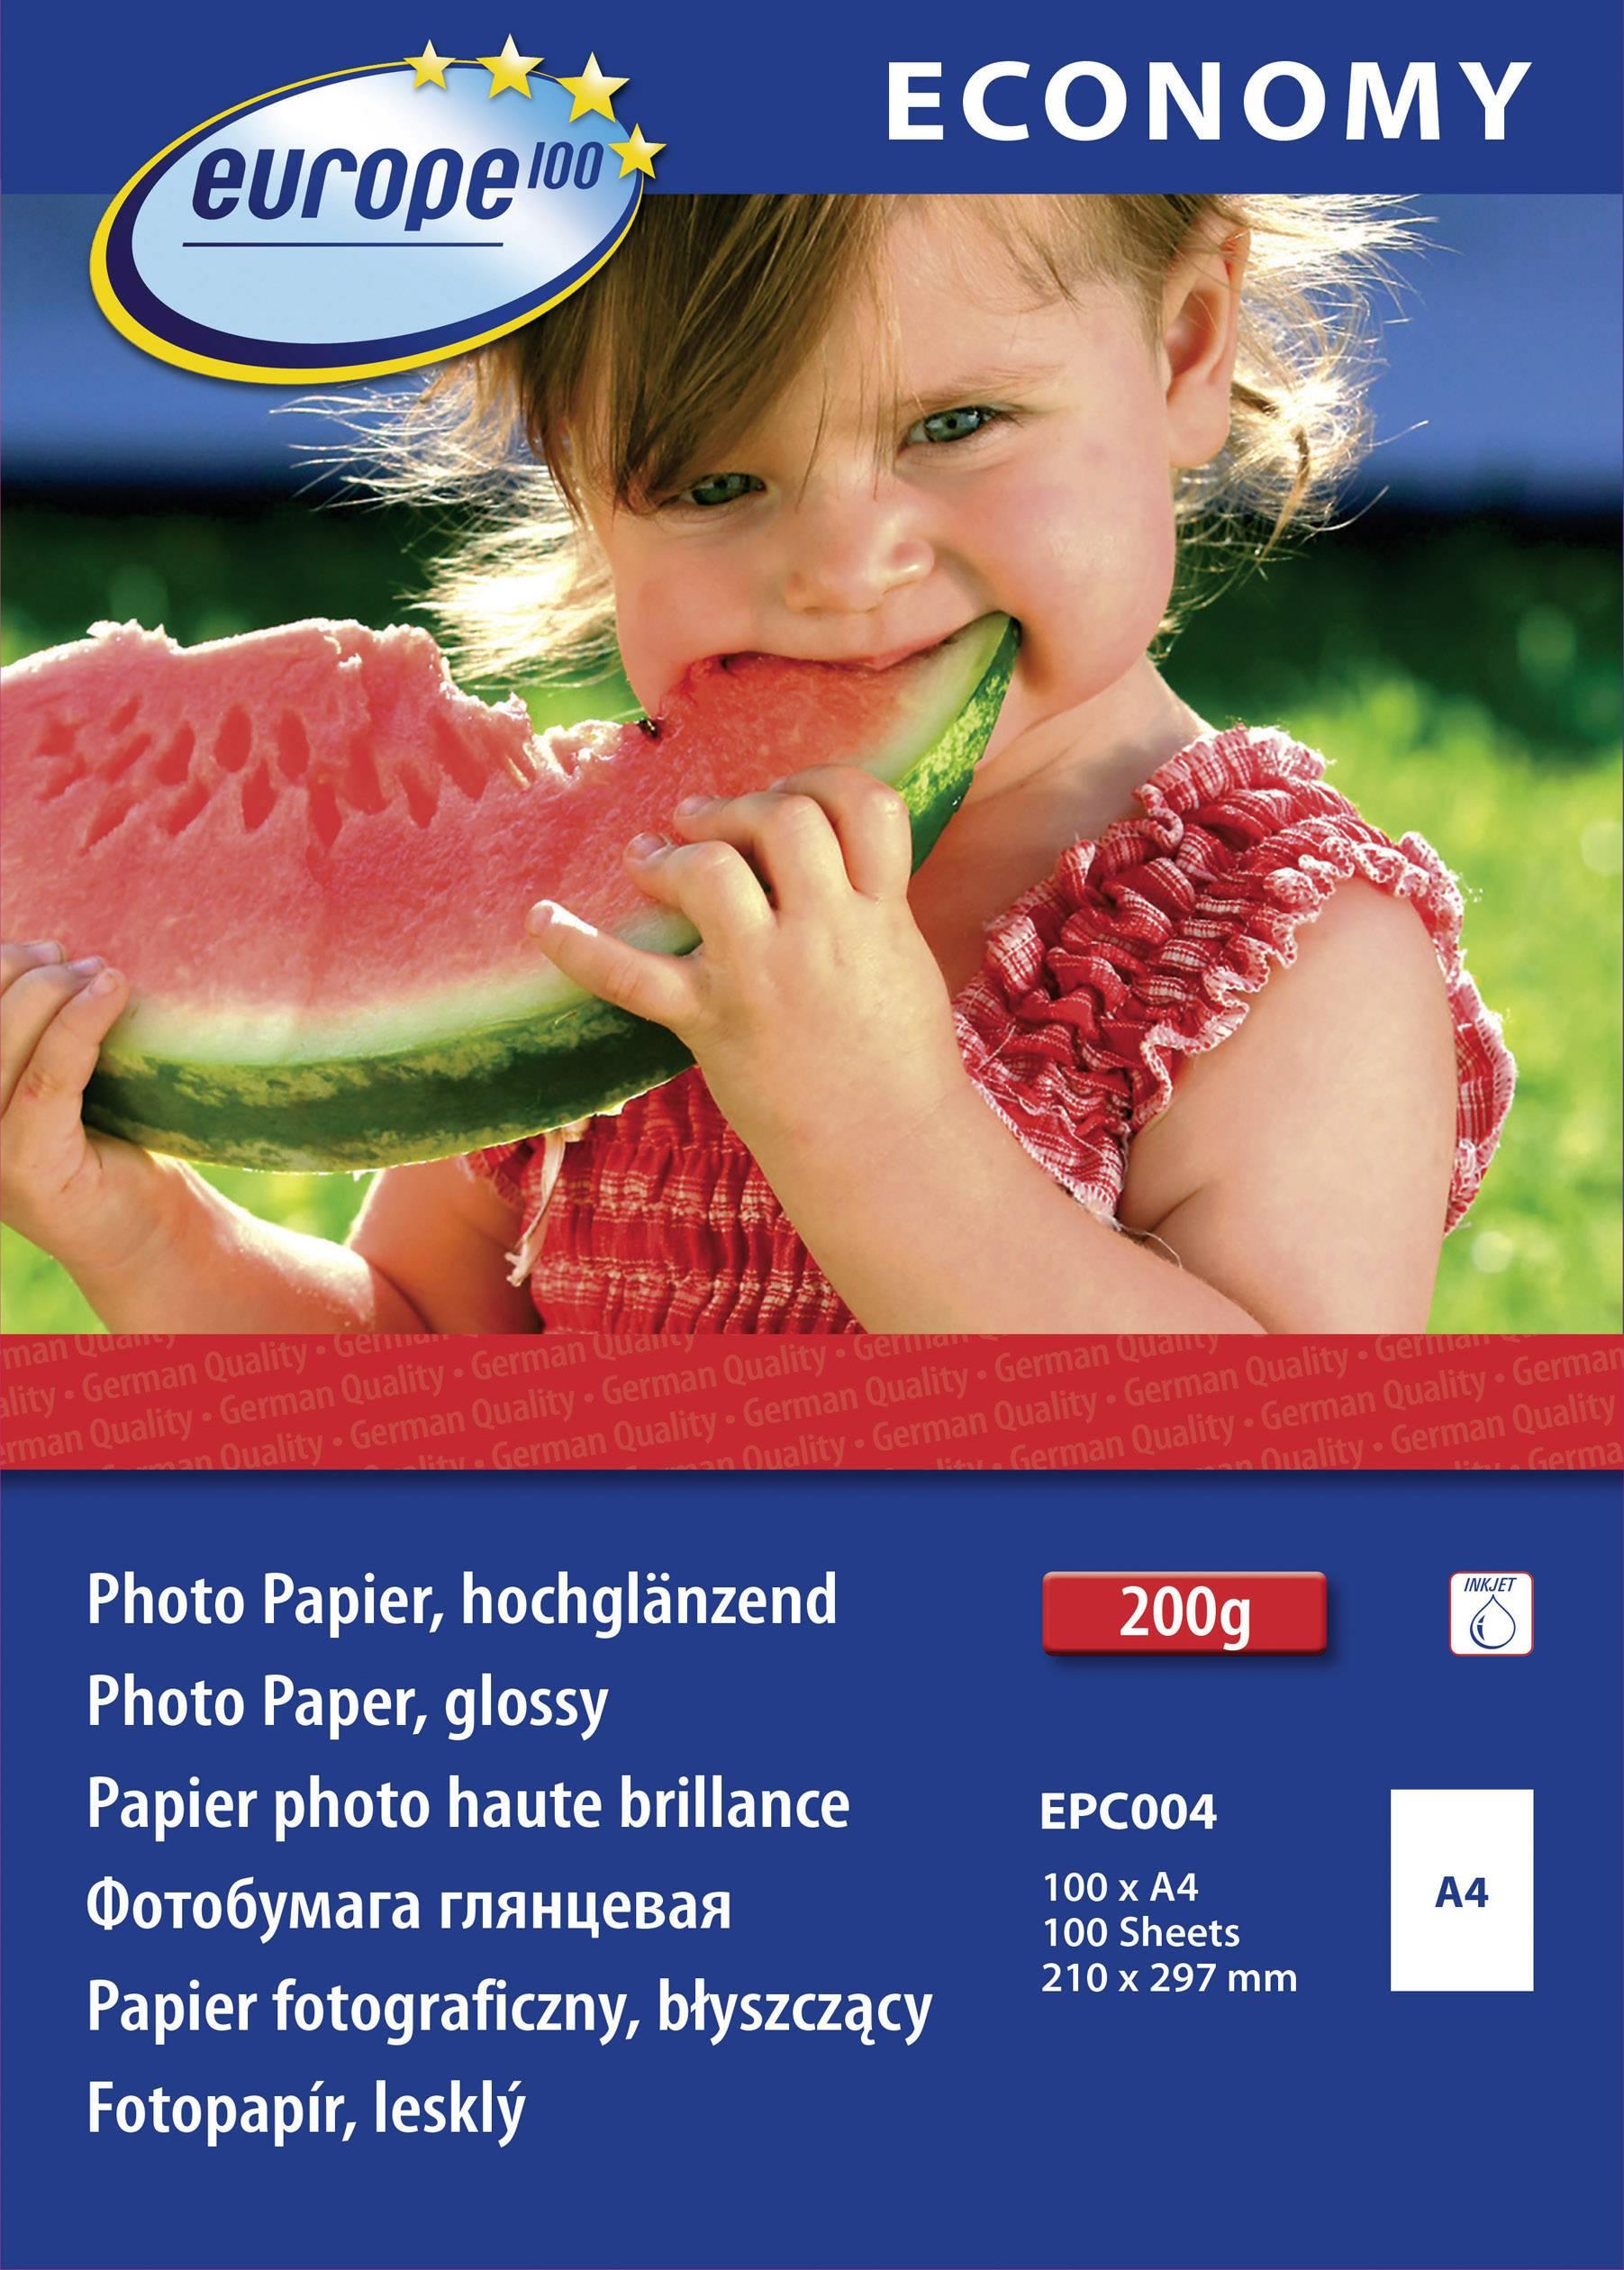 Fotopapír Europe100 EPC004, A4, vysoký lesk, 210 g/m², 100 listů, bílý